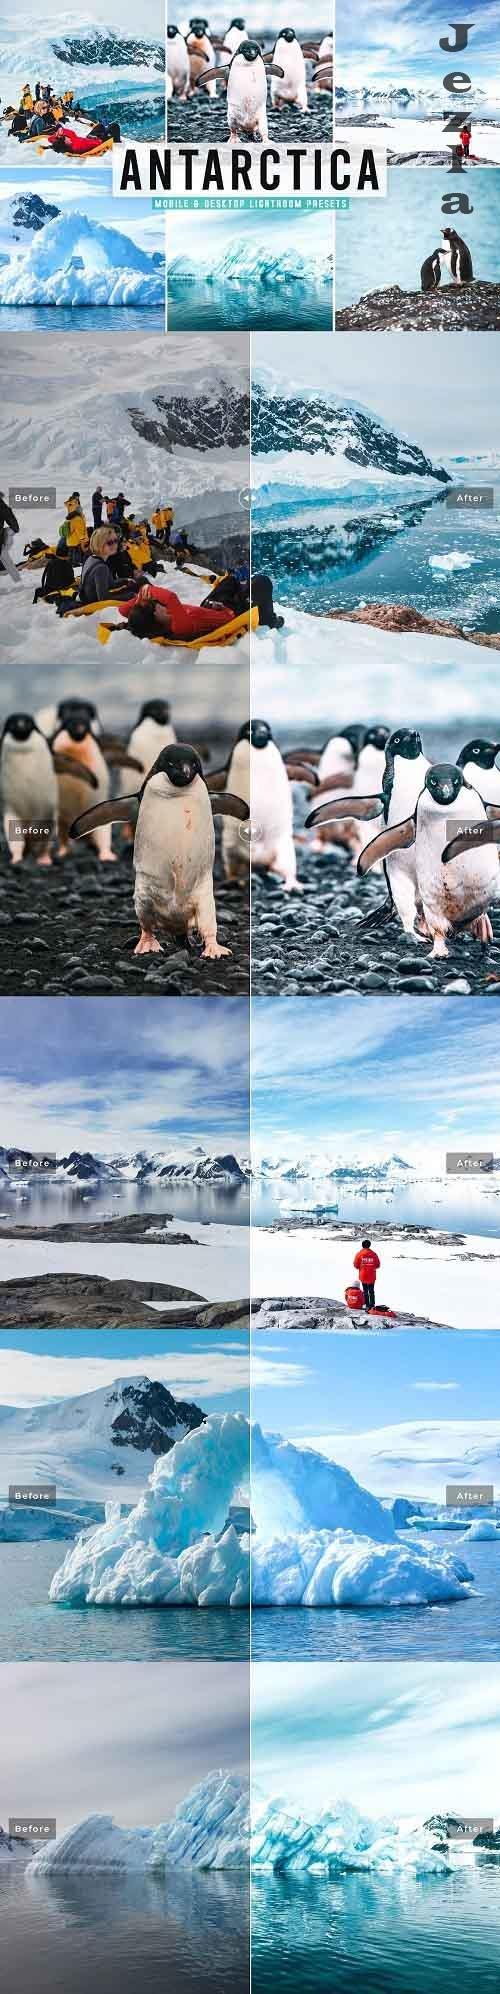 CreativeMarket - Antarctica Pro LRM Presets - 5495663 - Mobile & Desktop